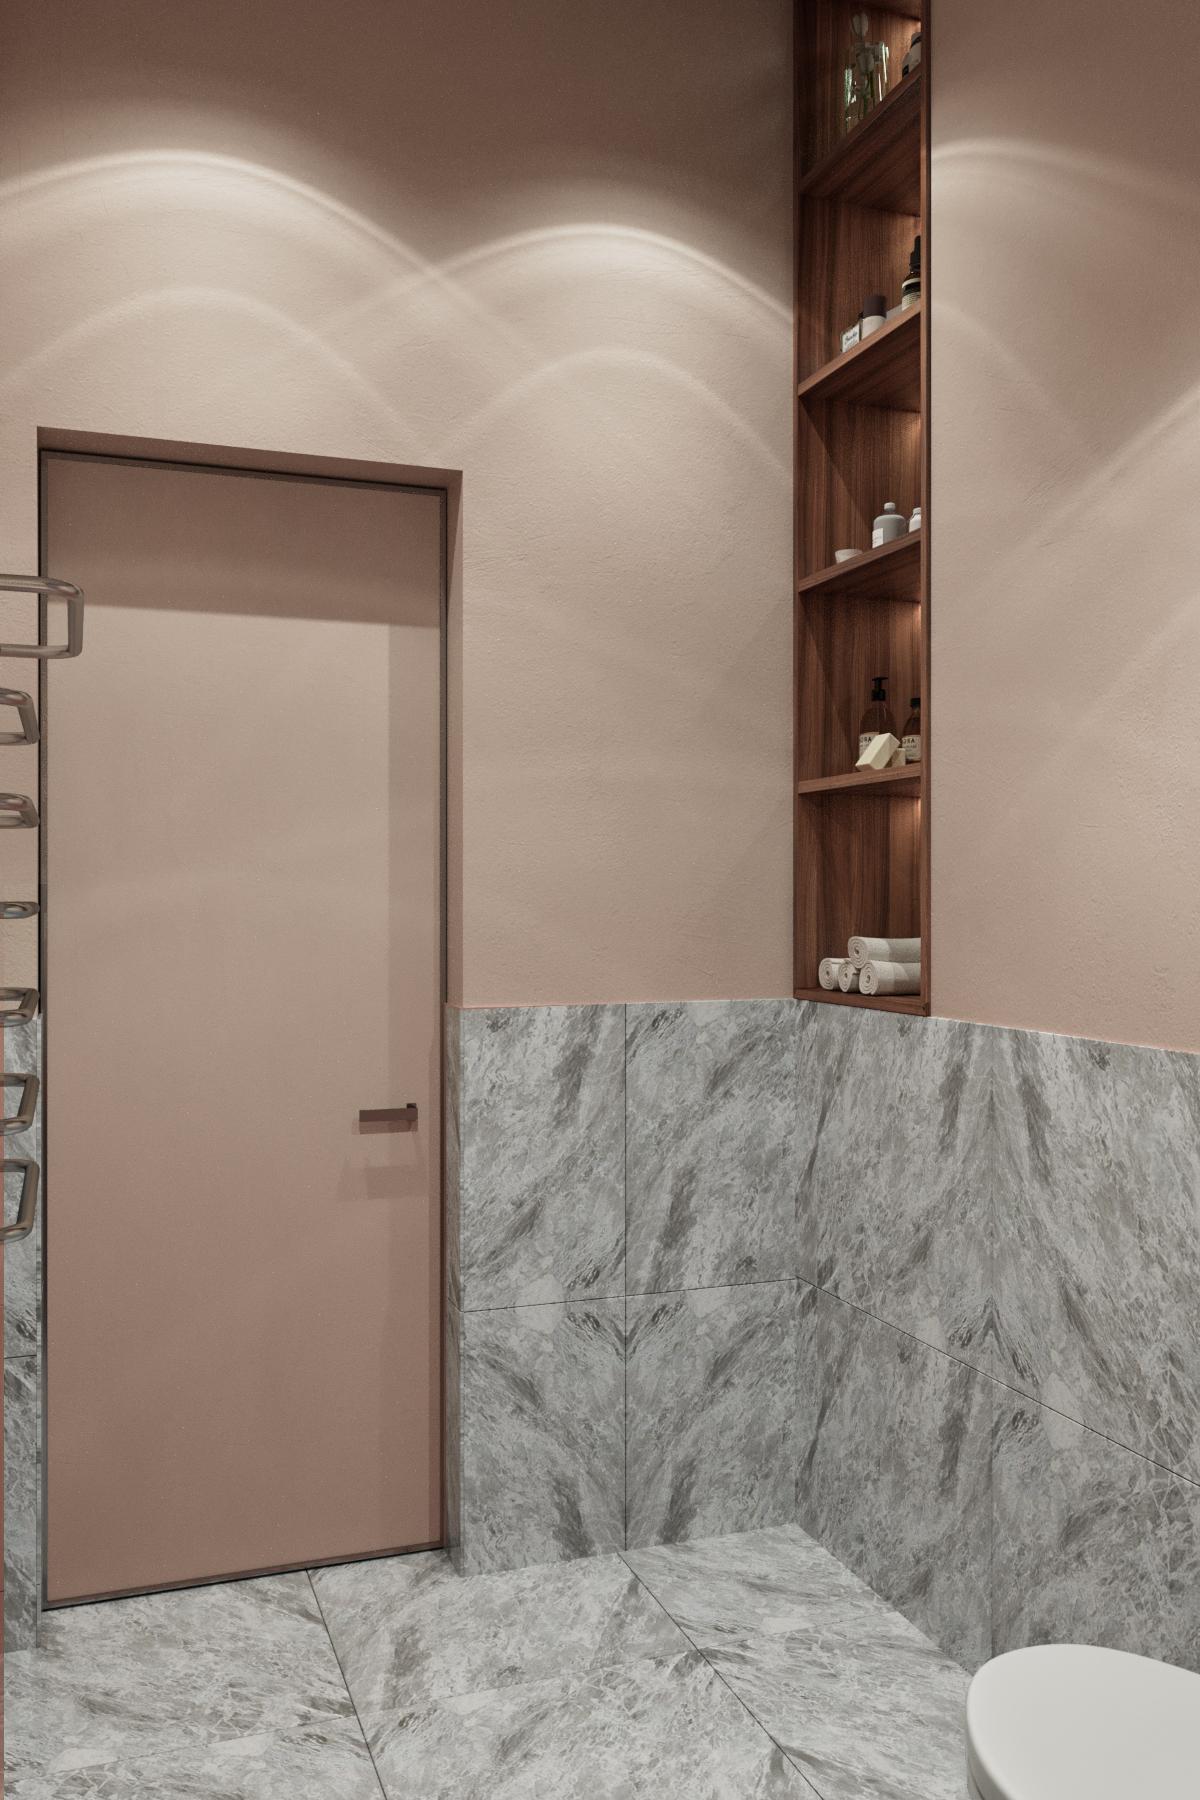 bathroom_guest_2fl_vladimirskaya_obl_30.07.2020_2_02